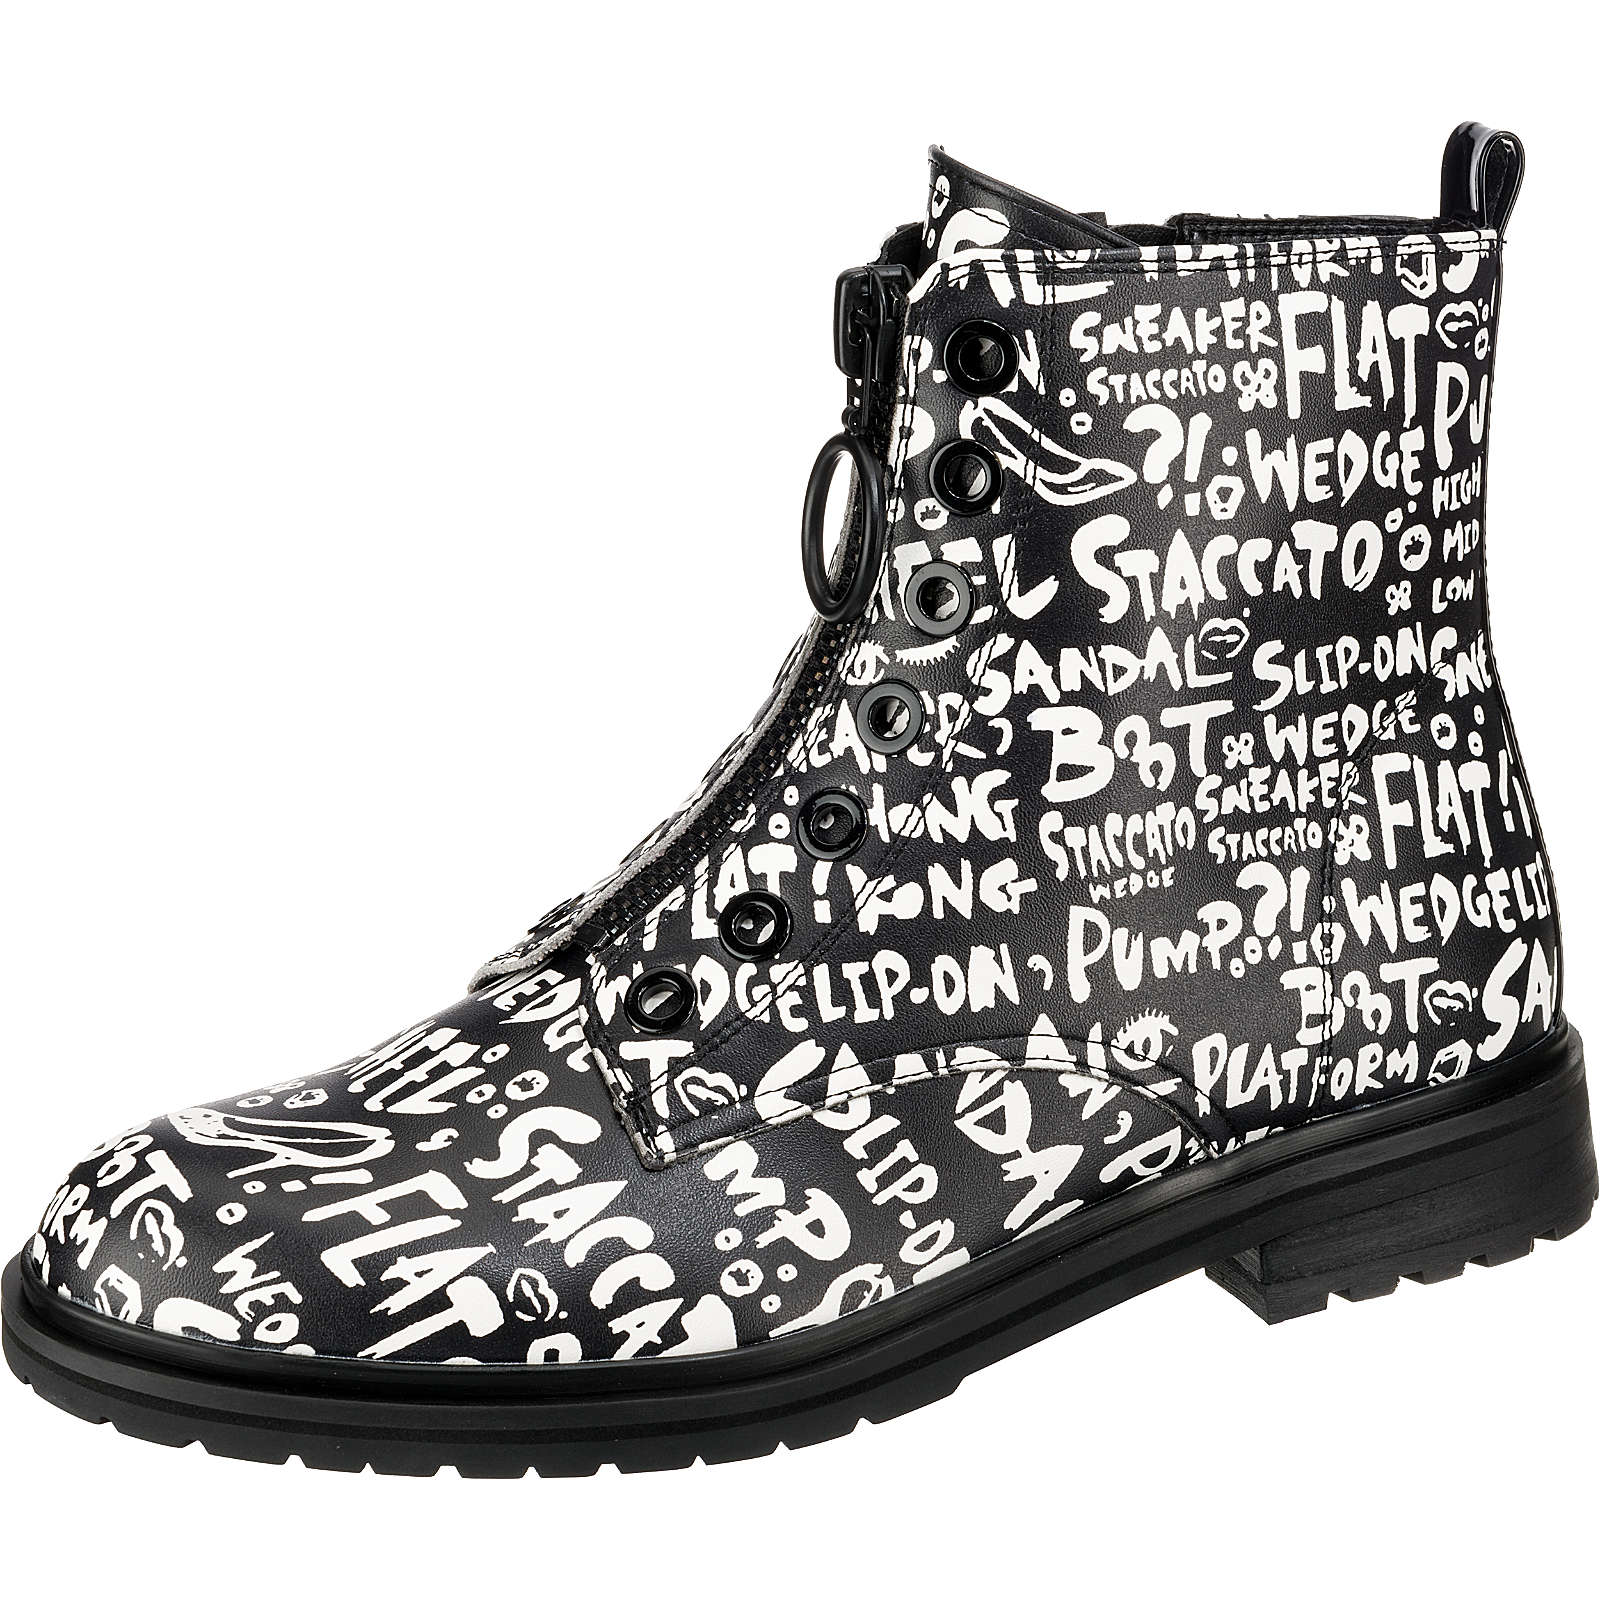 BUFFALO Arabella Biker Boots schwarz/weiß Damen Gr. 40